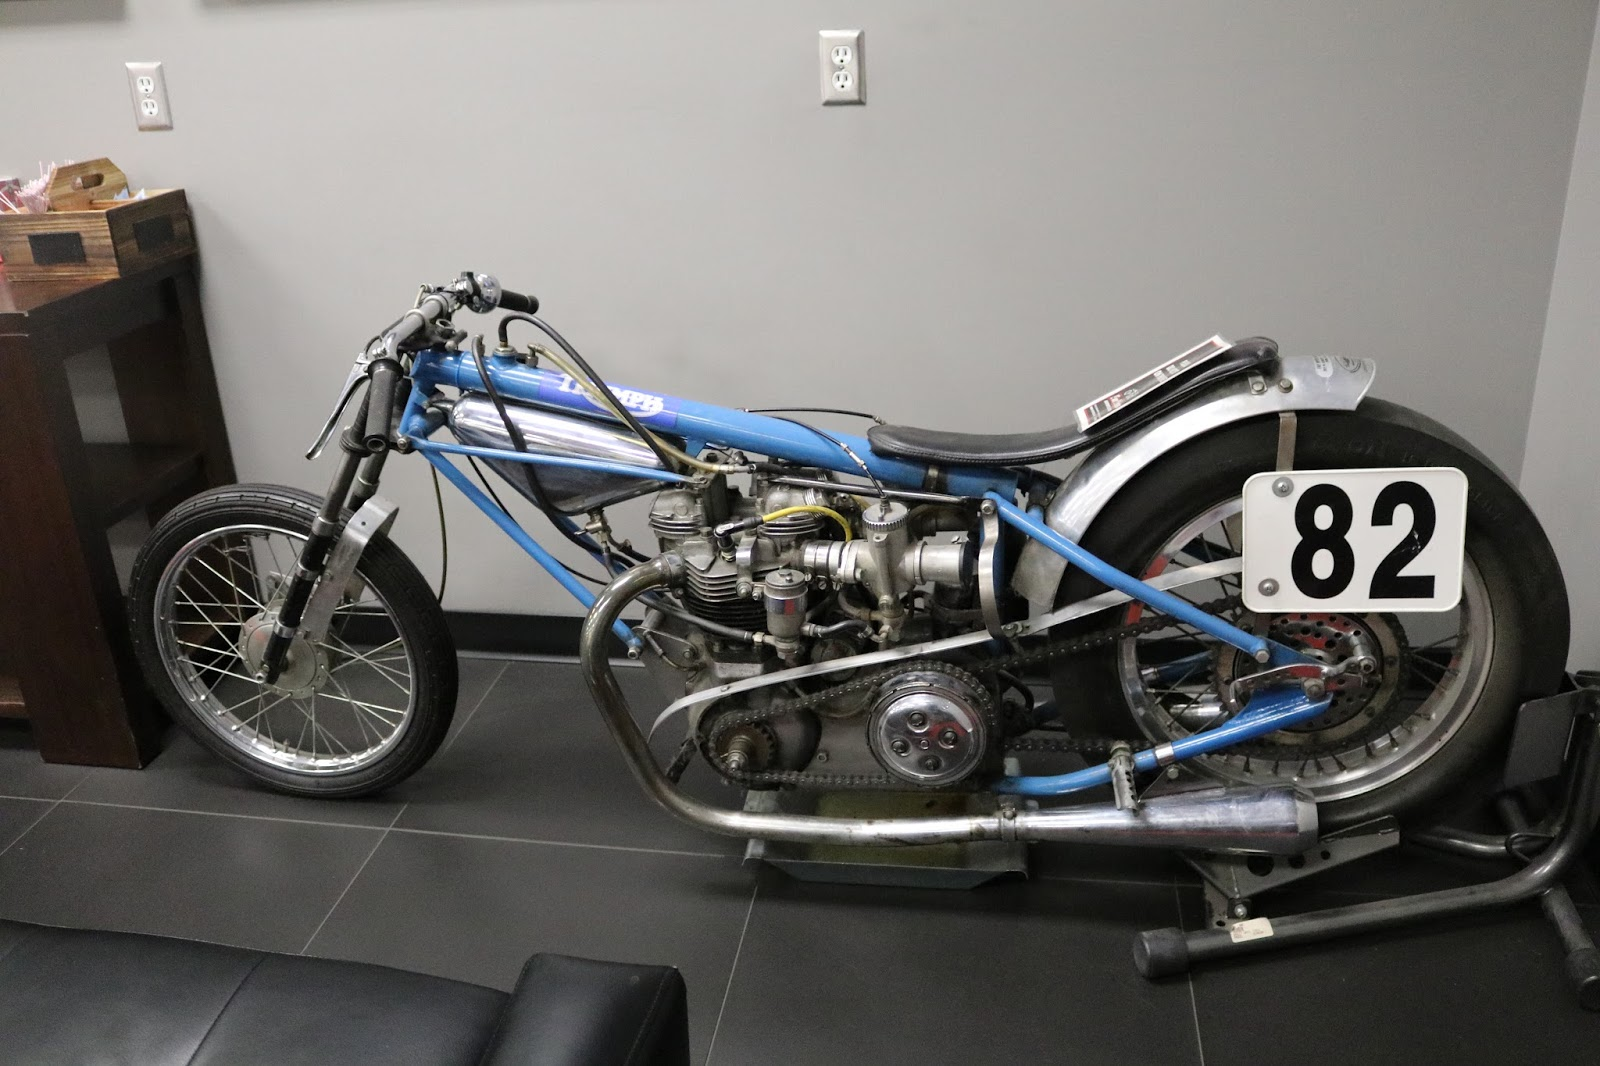 Oldmotodude Triumph Drag Bike On Display At Fay Myers